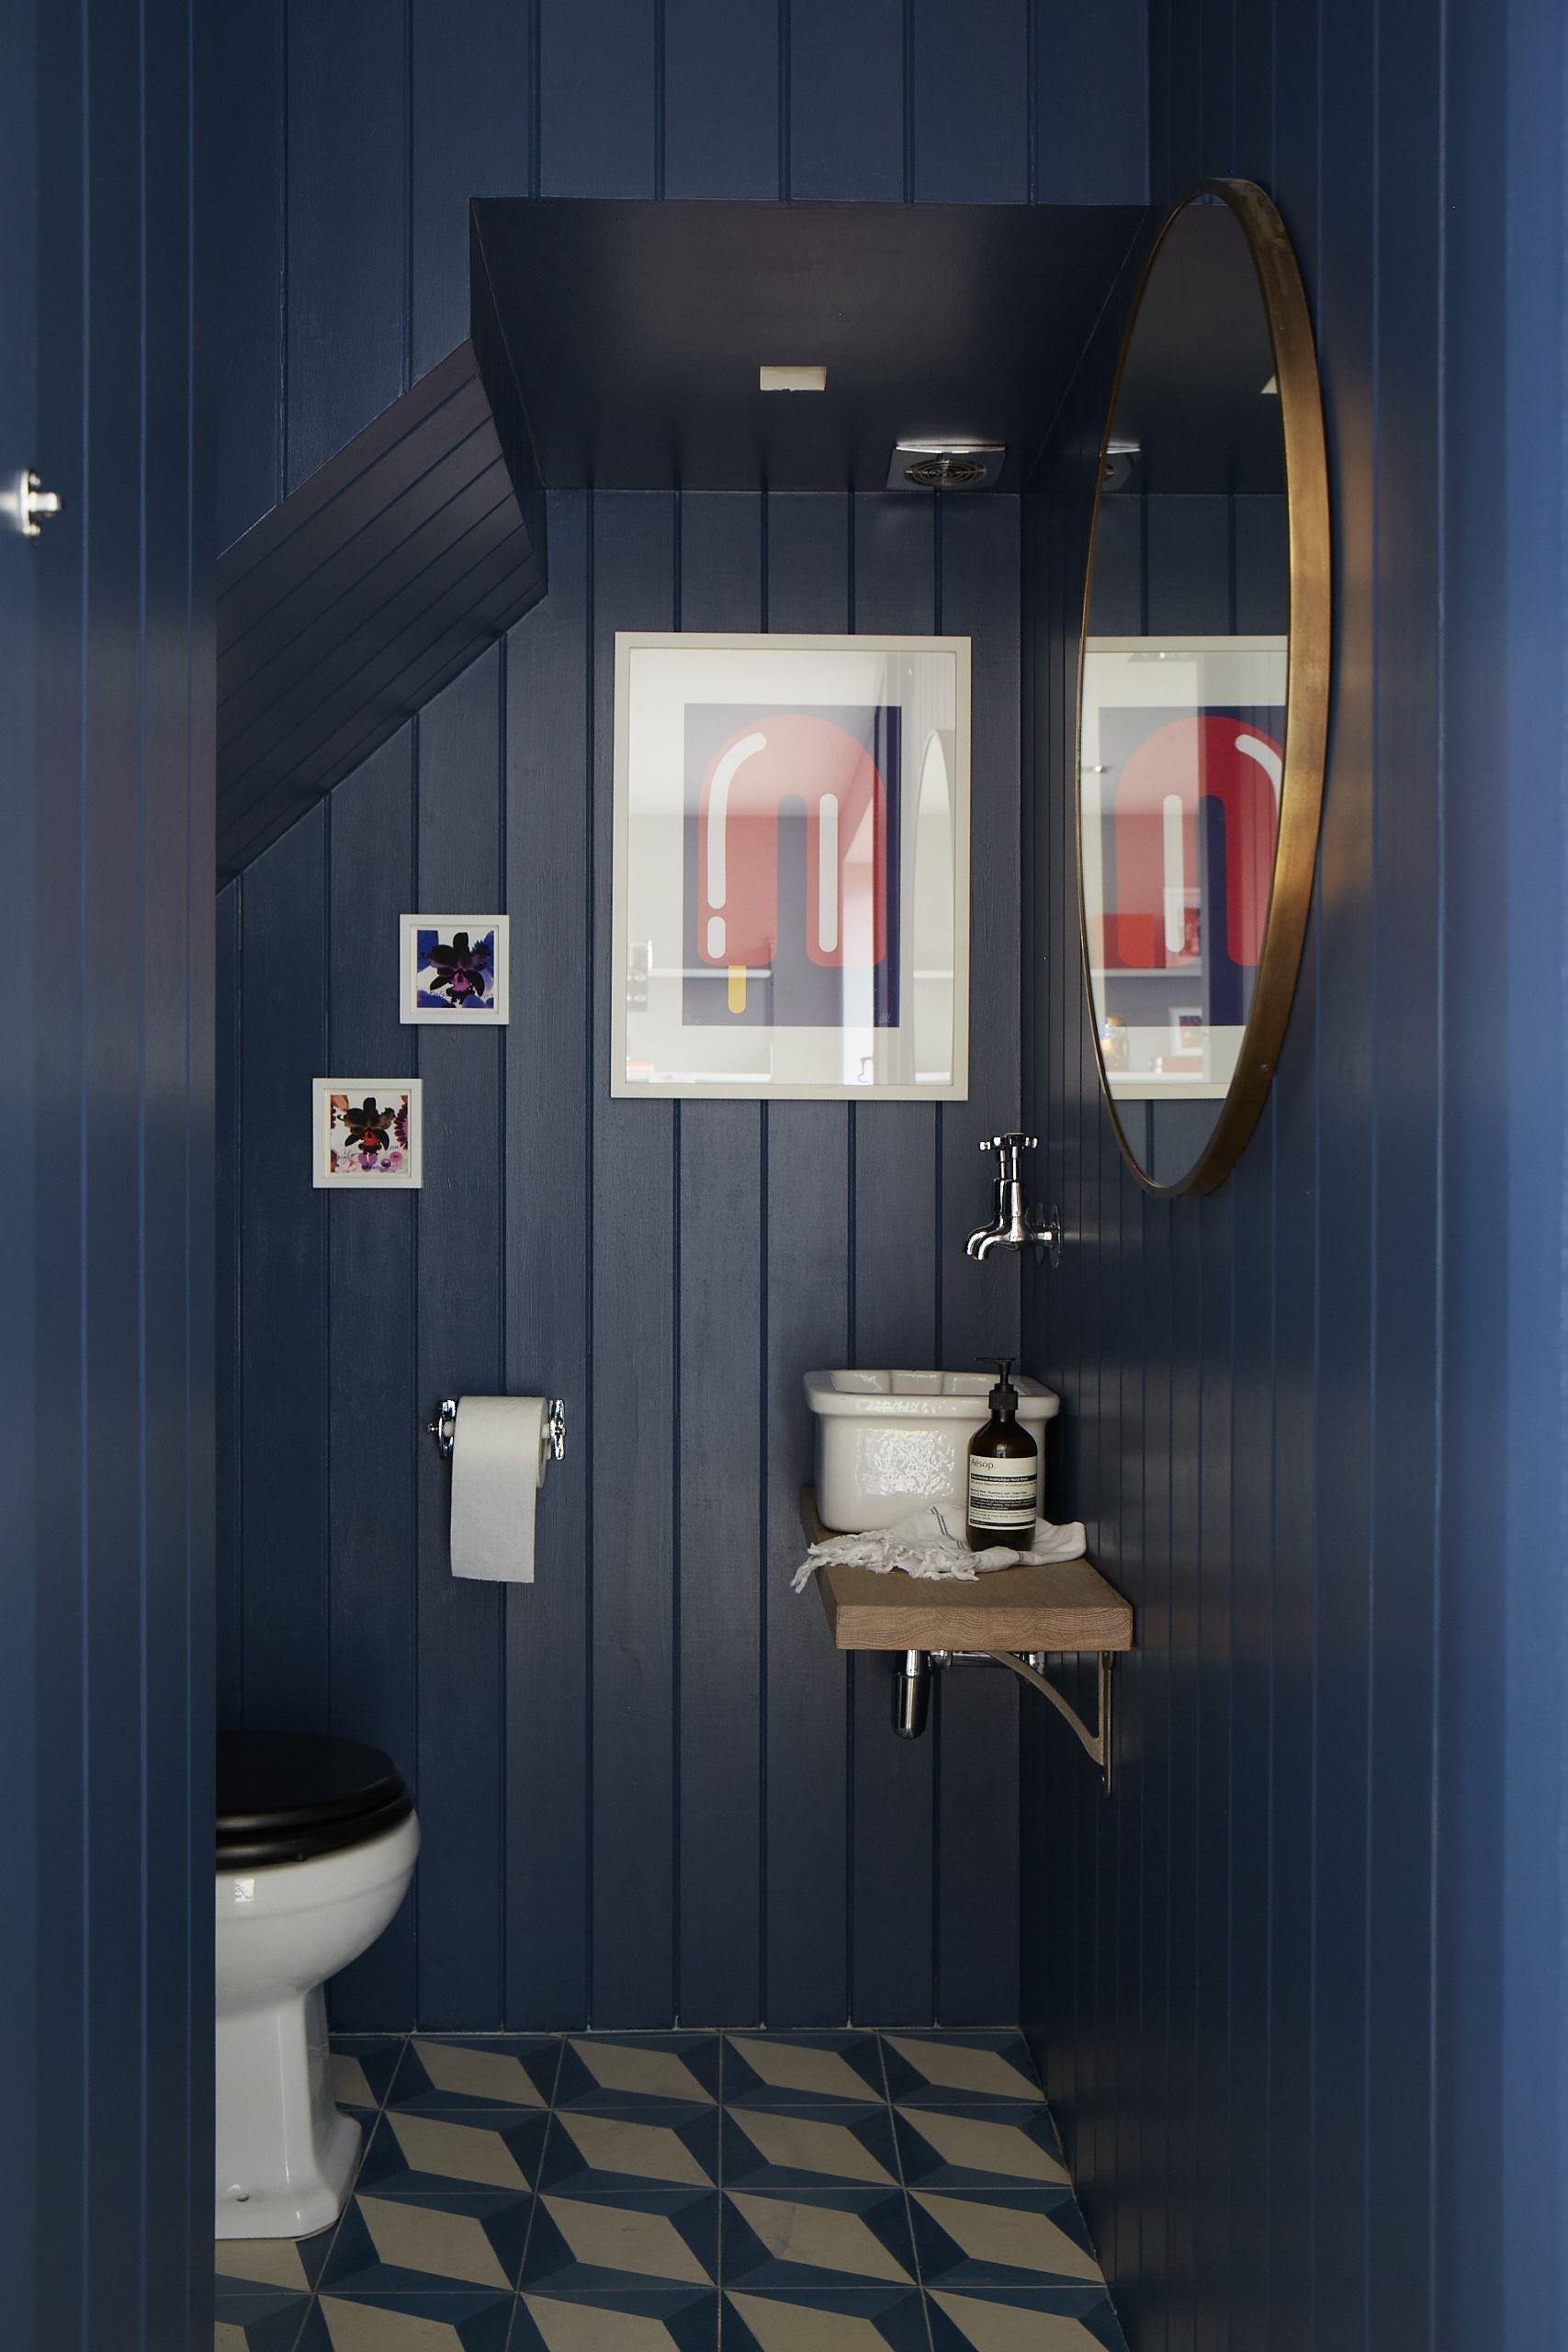 Blue walls | Cladding | Patterned tiles | Bathroom | Modern art ...